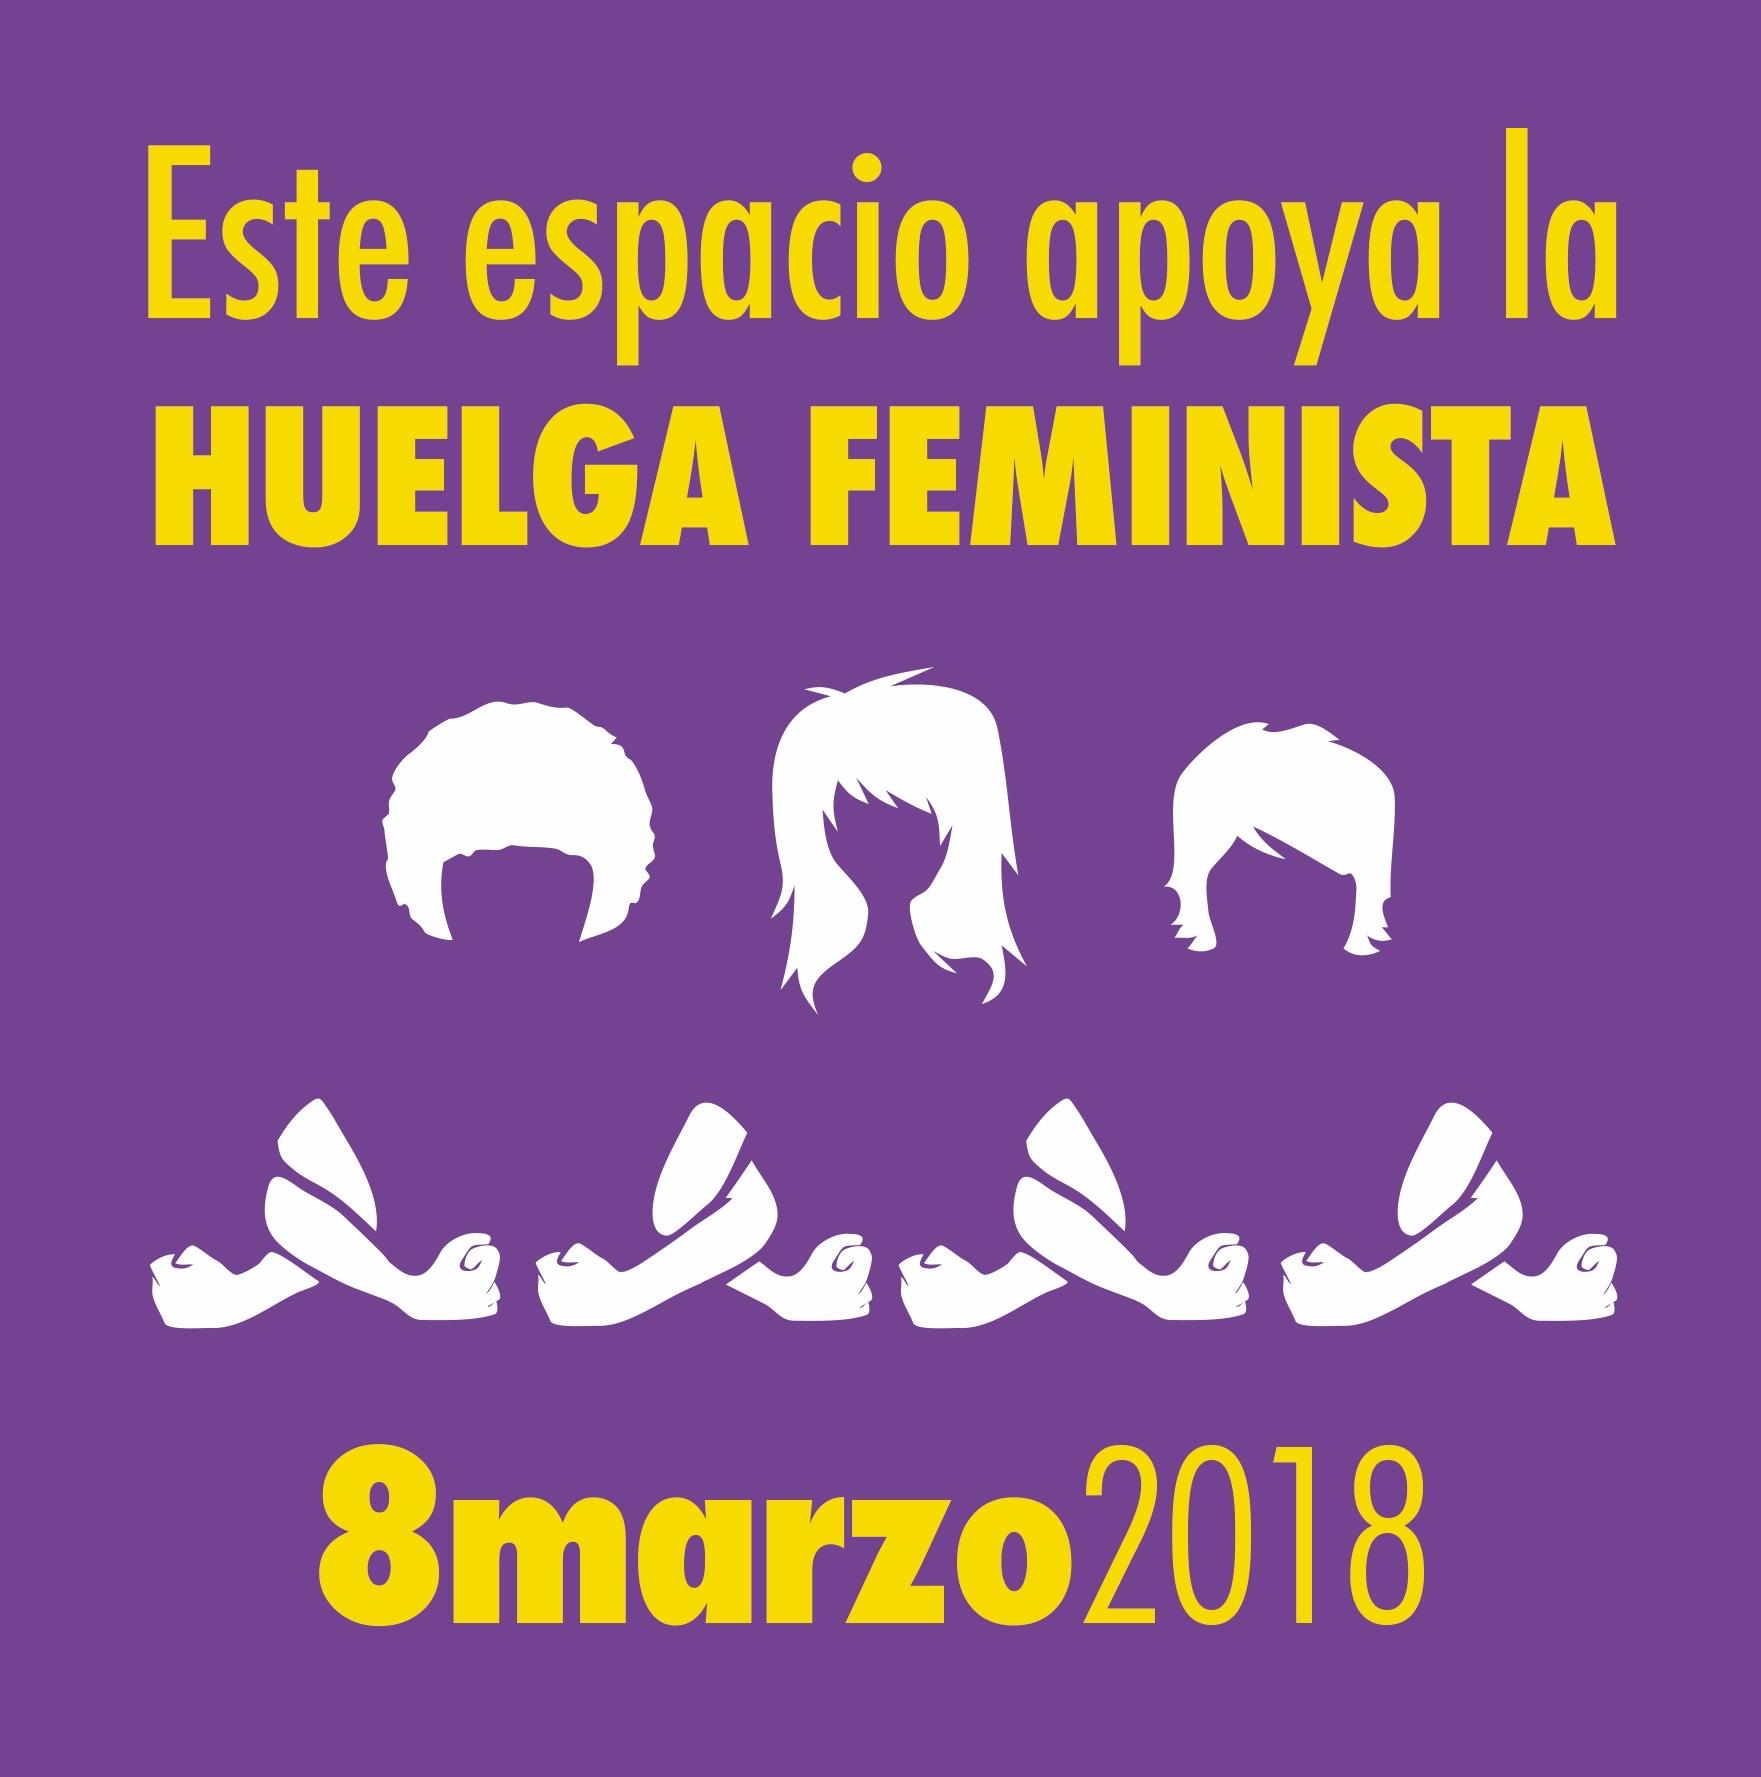 Apoyamos la huelga feminista 8M